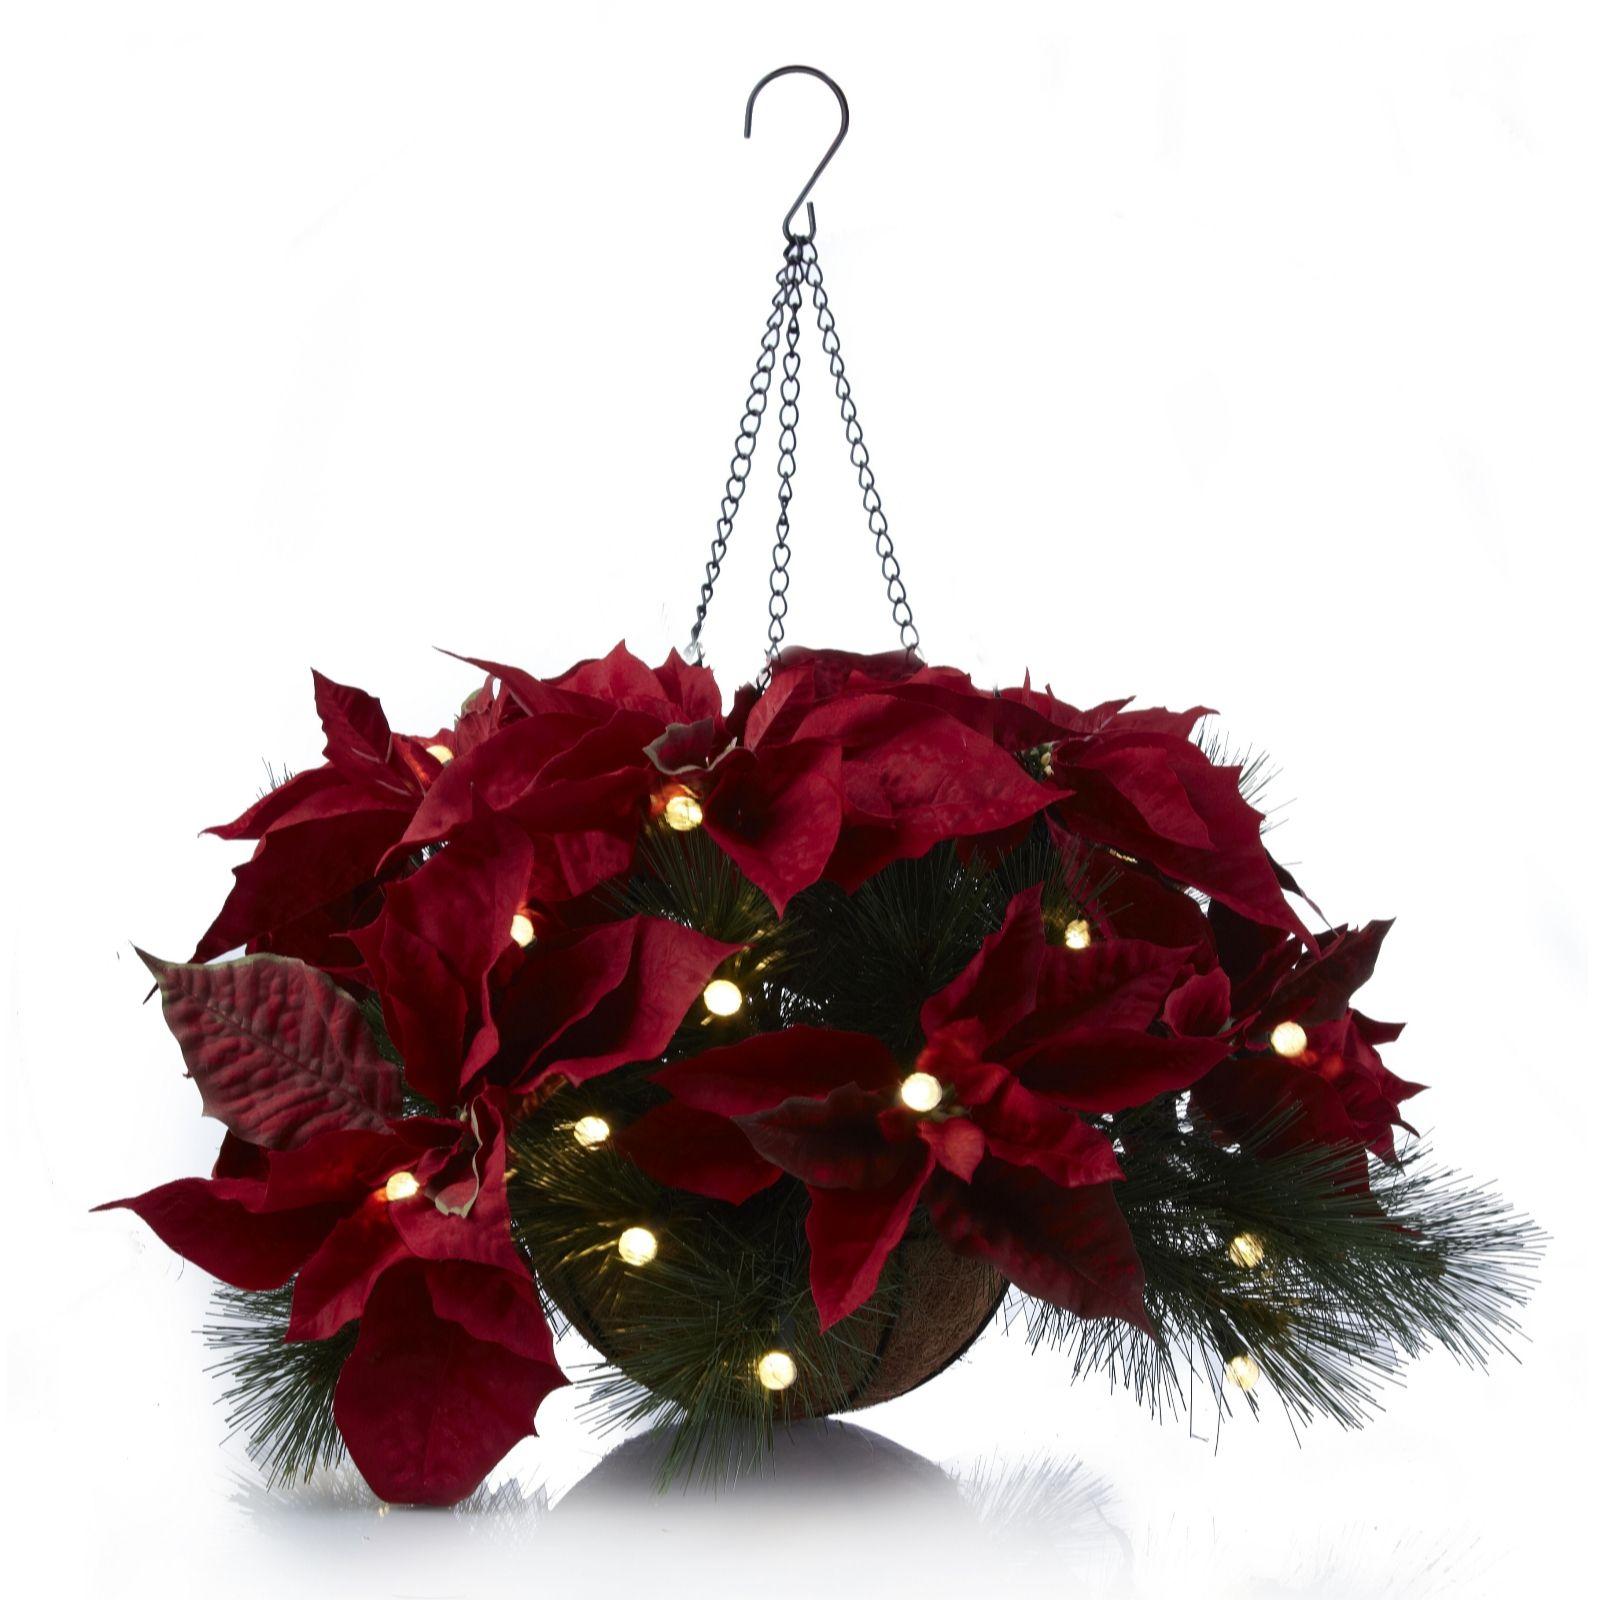 Christmas Hanging Baskets.Bethlehem Lights Pre Lit Hanging Basket With Poinsettia Faux Flowers Qvc Uk